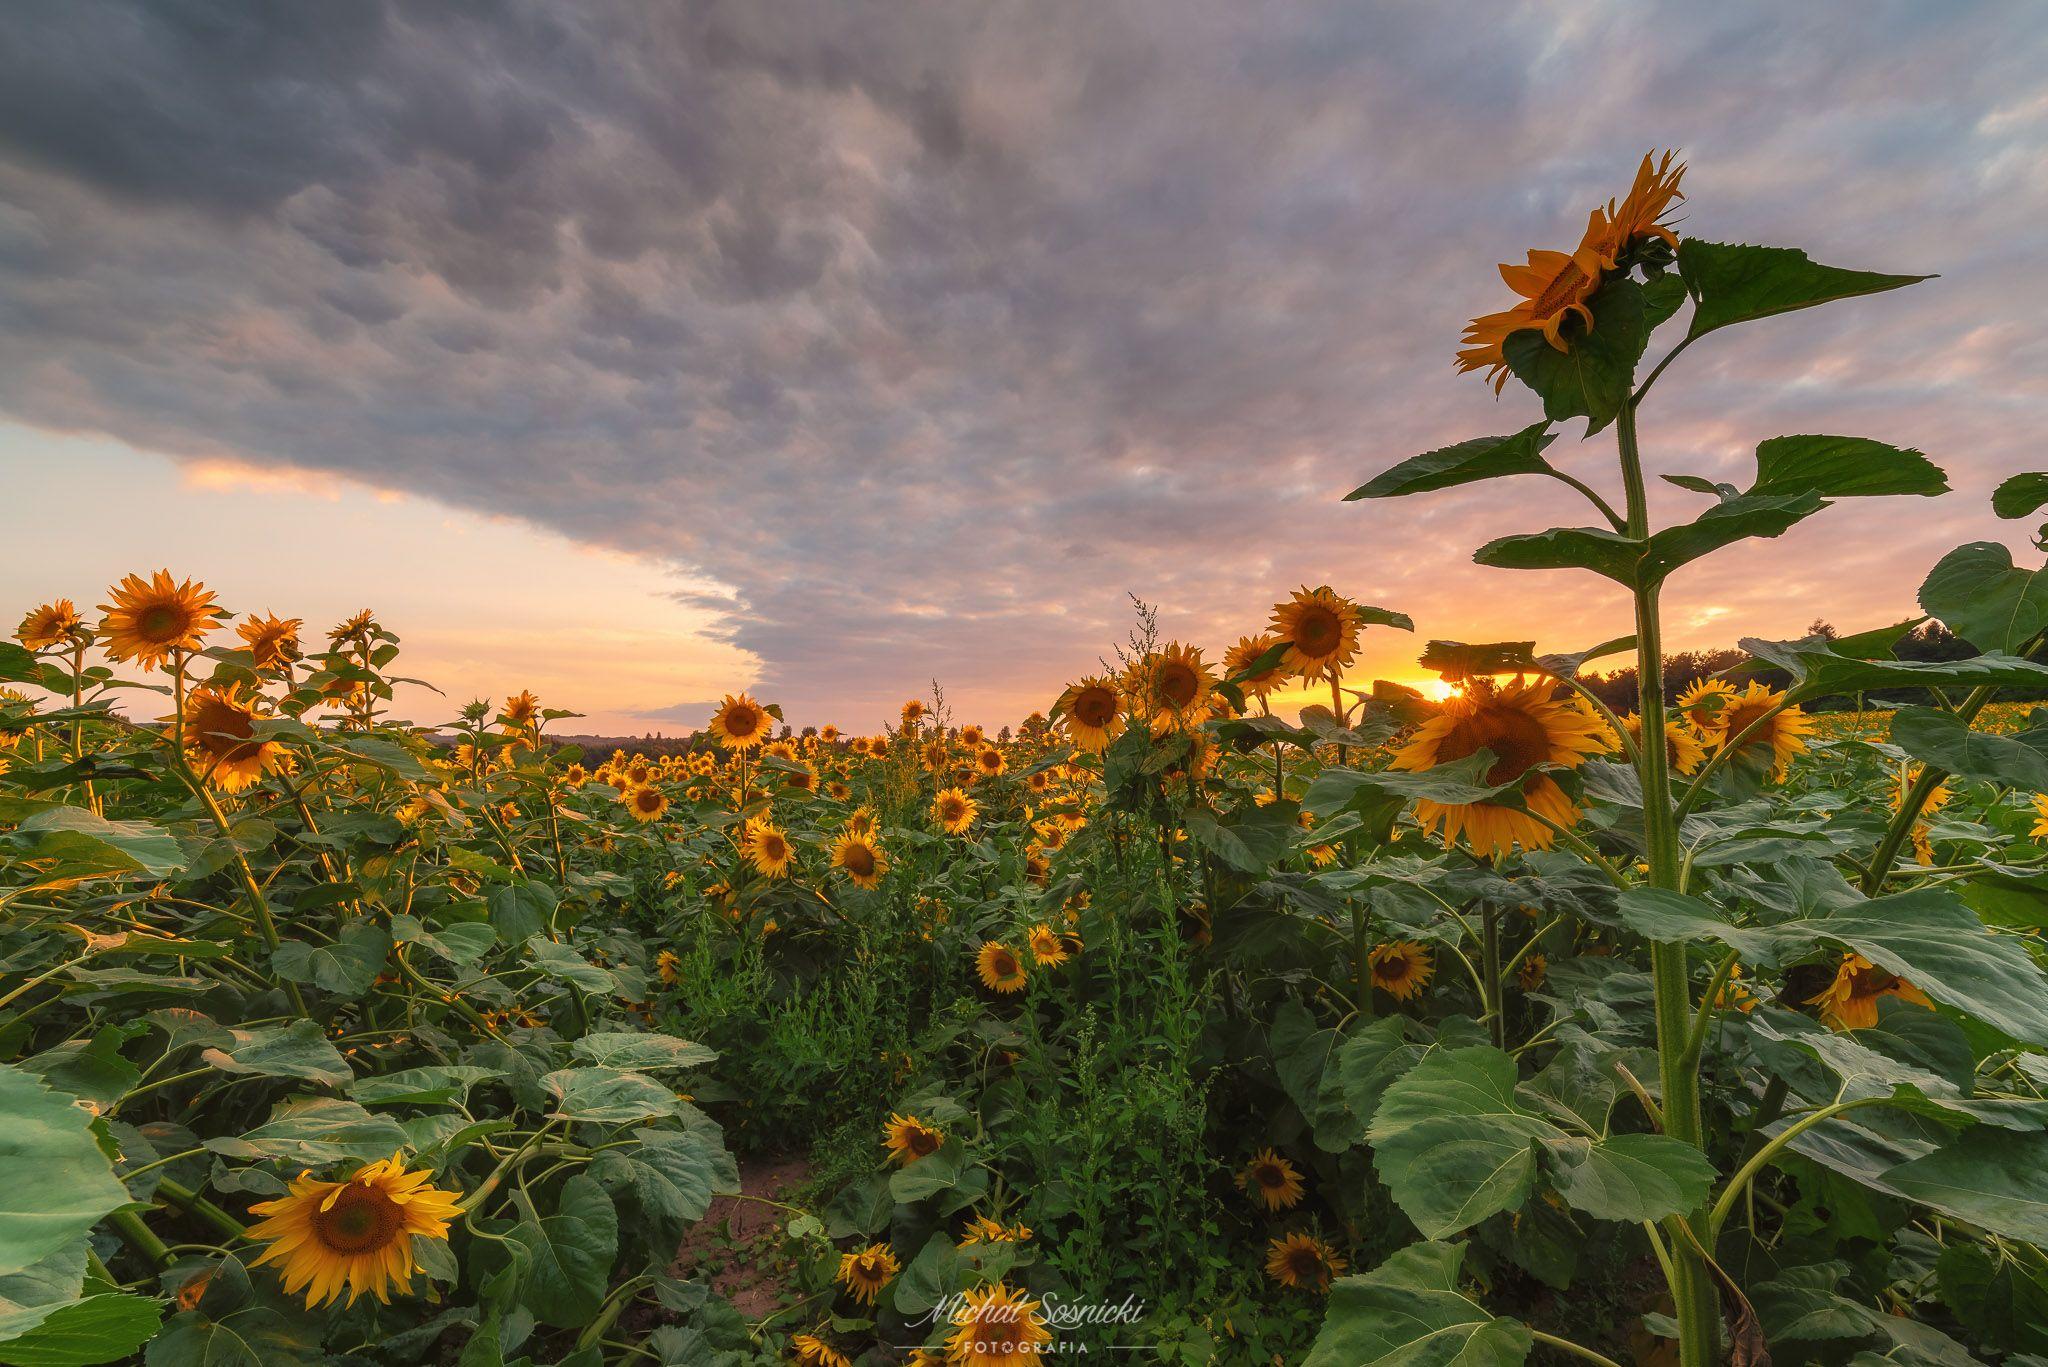 #sunflower #sunflowers #sunset #sky #flower #flowers #sky #poland #summer, Sośnicki Michał